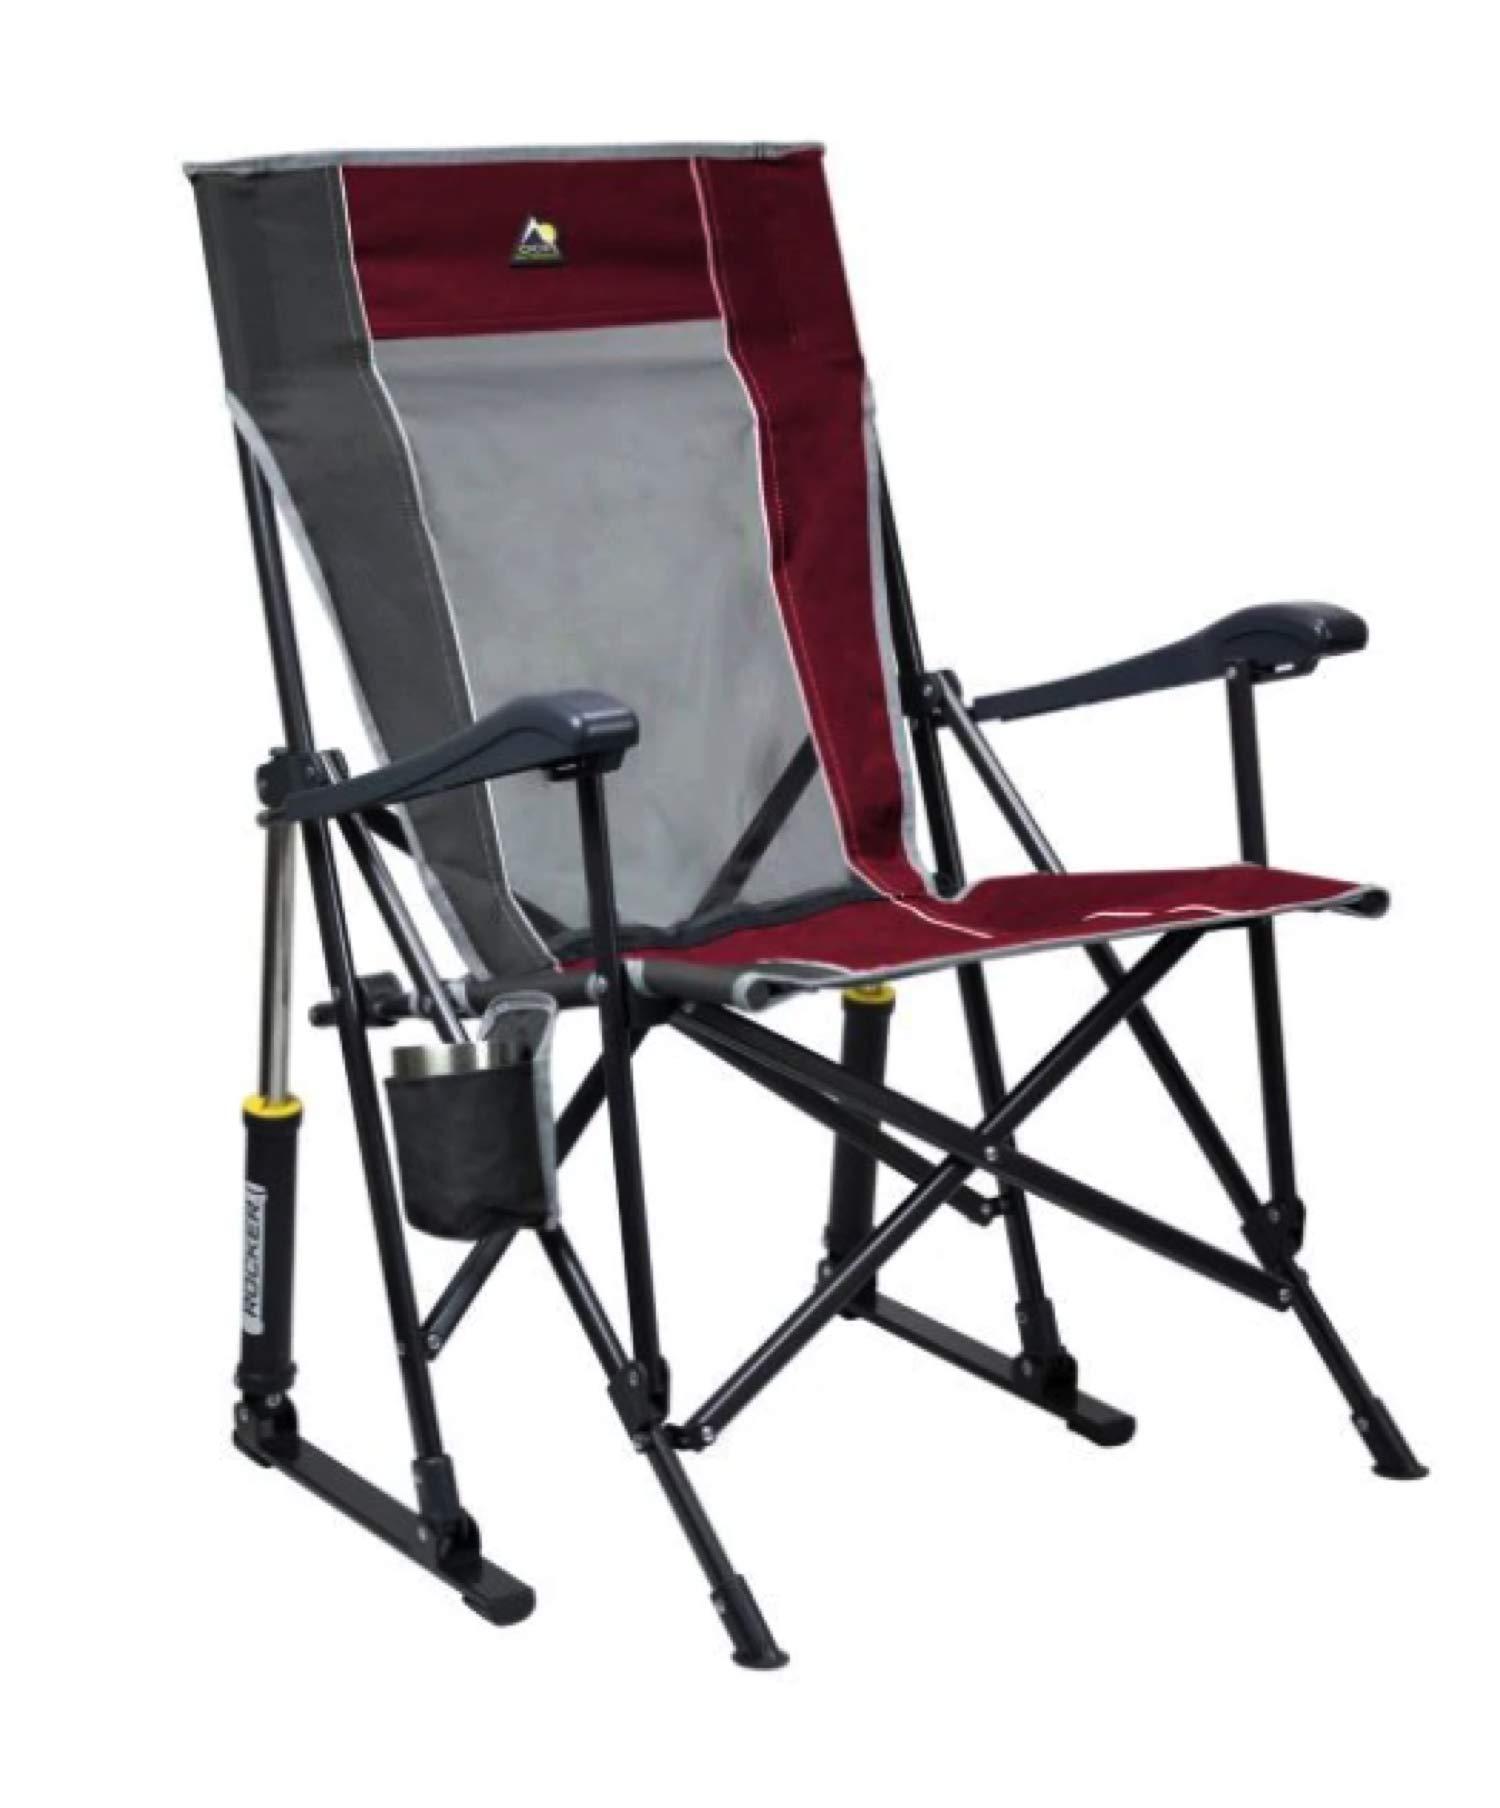 GCI Roadtrip Rocking Chair Outdoor (Cinnamon/Pewter) by GCI